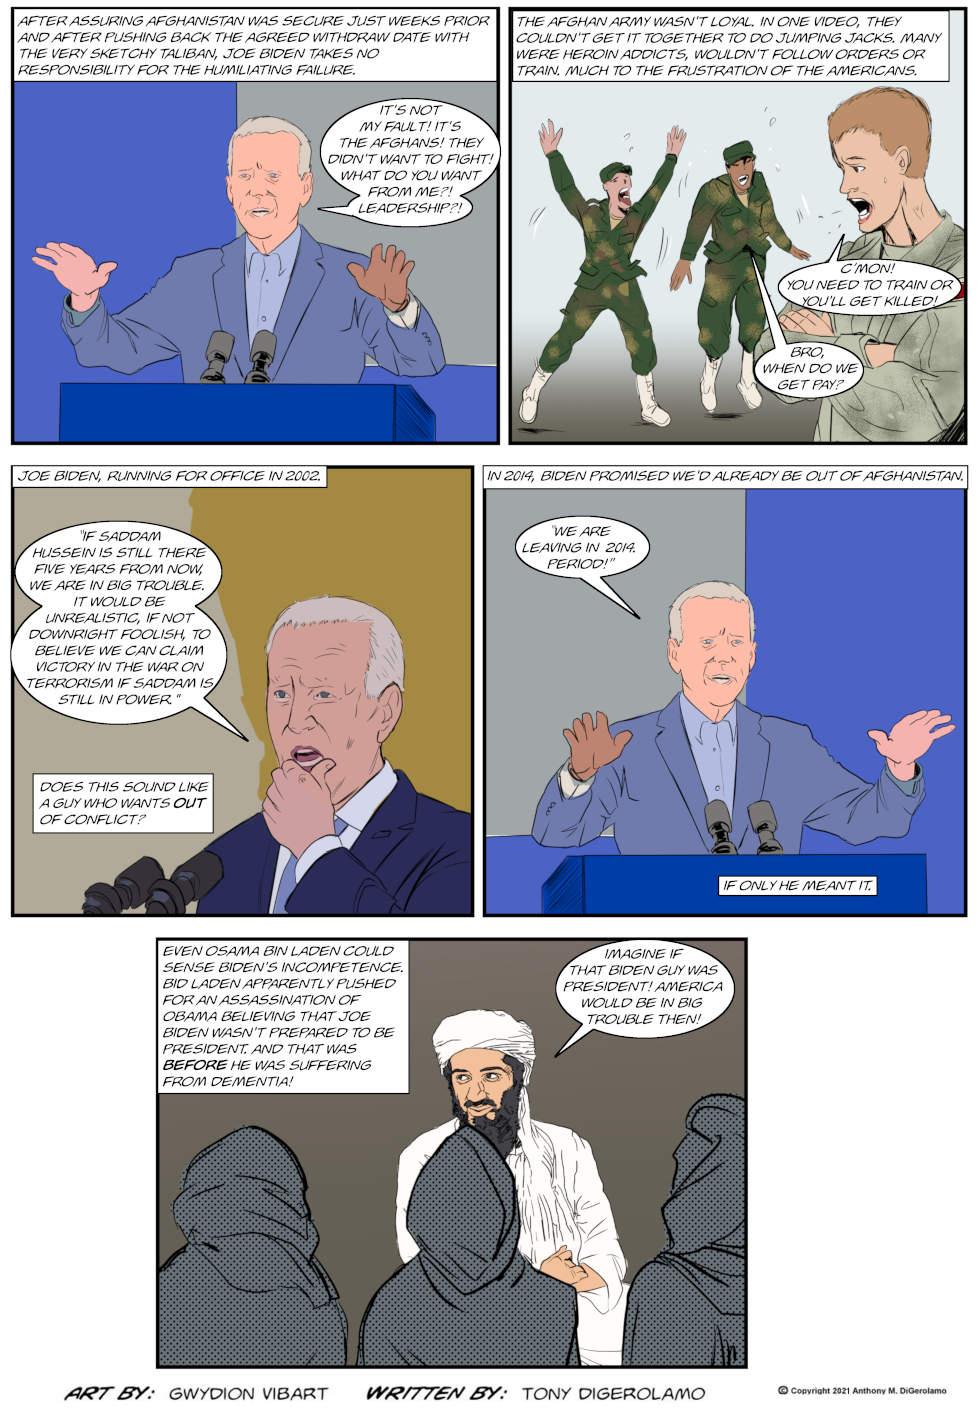 The Antiwar Comic: Everyone Saw It Coming